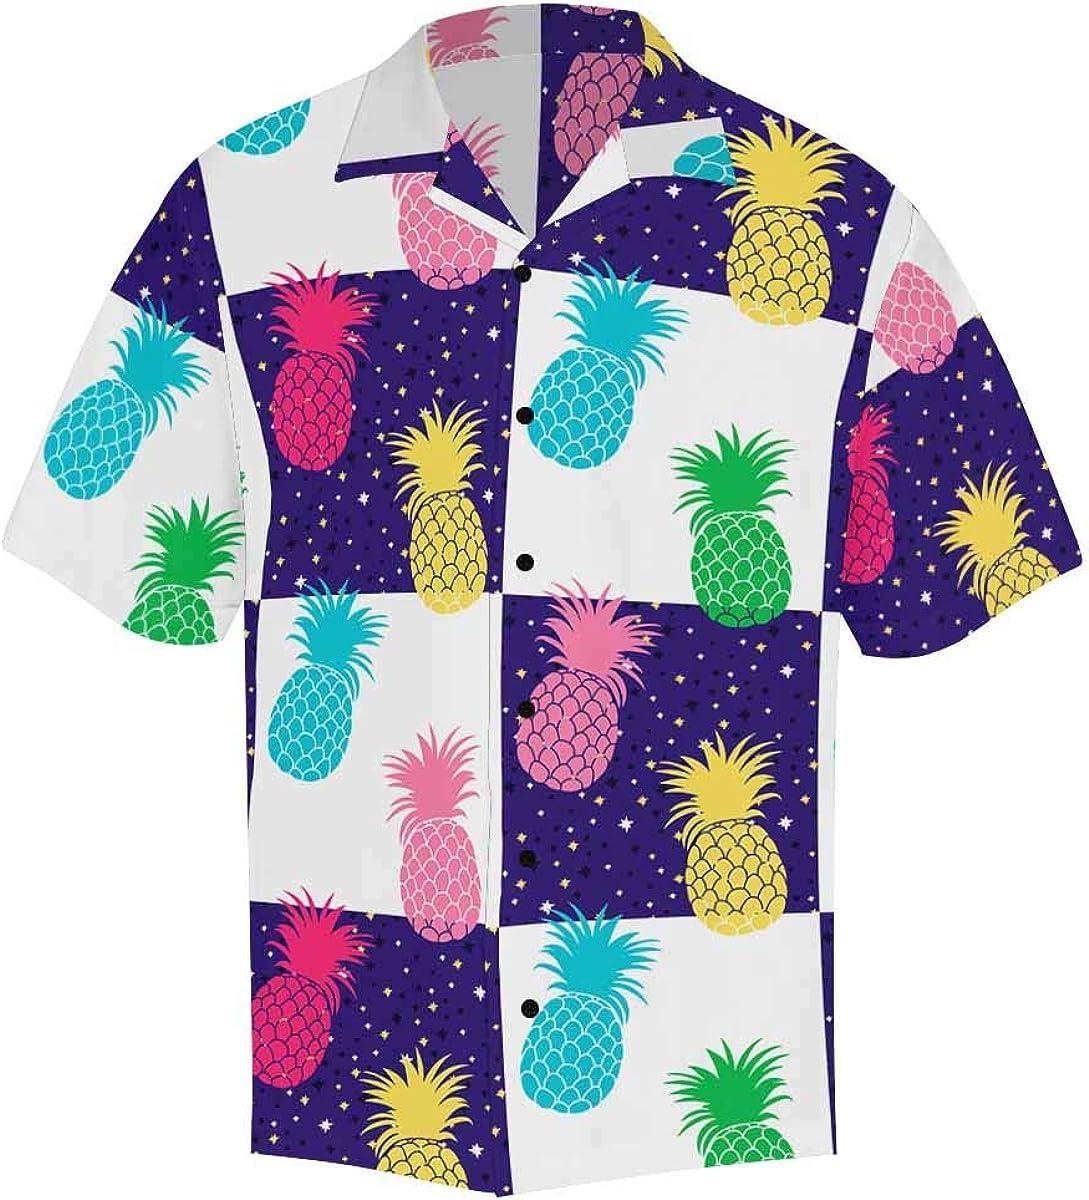 InterestPrint Men's Casual Button Down Short Sleeve Colorful Pineapple Check Hawaiian Shirt (S-5XL)